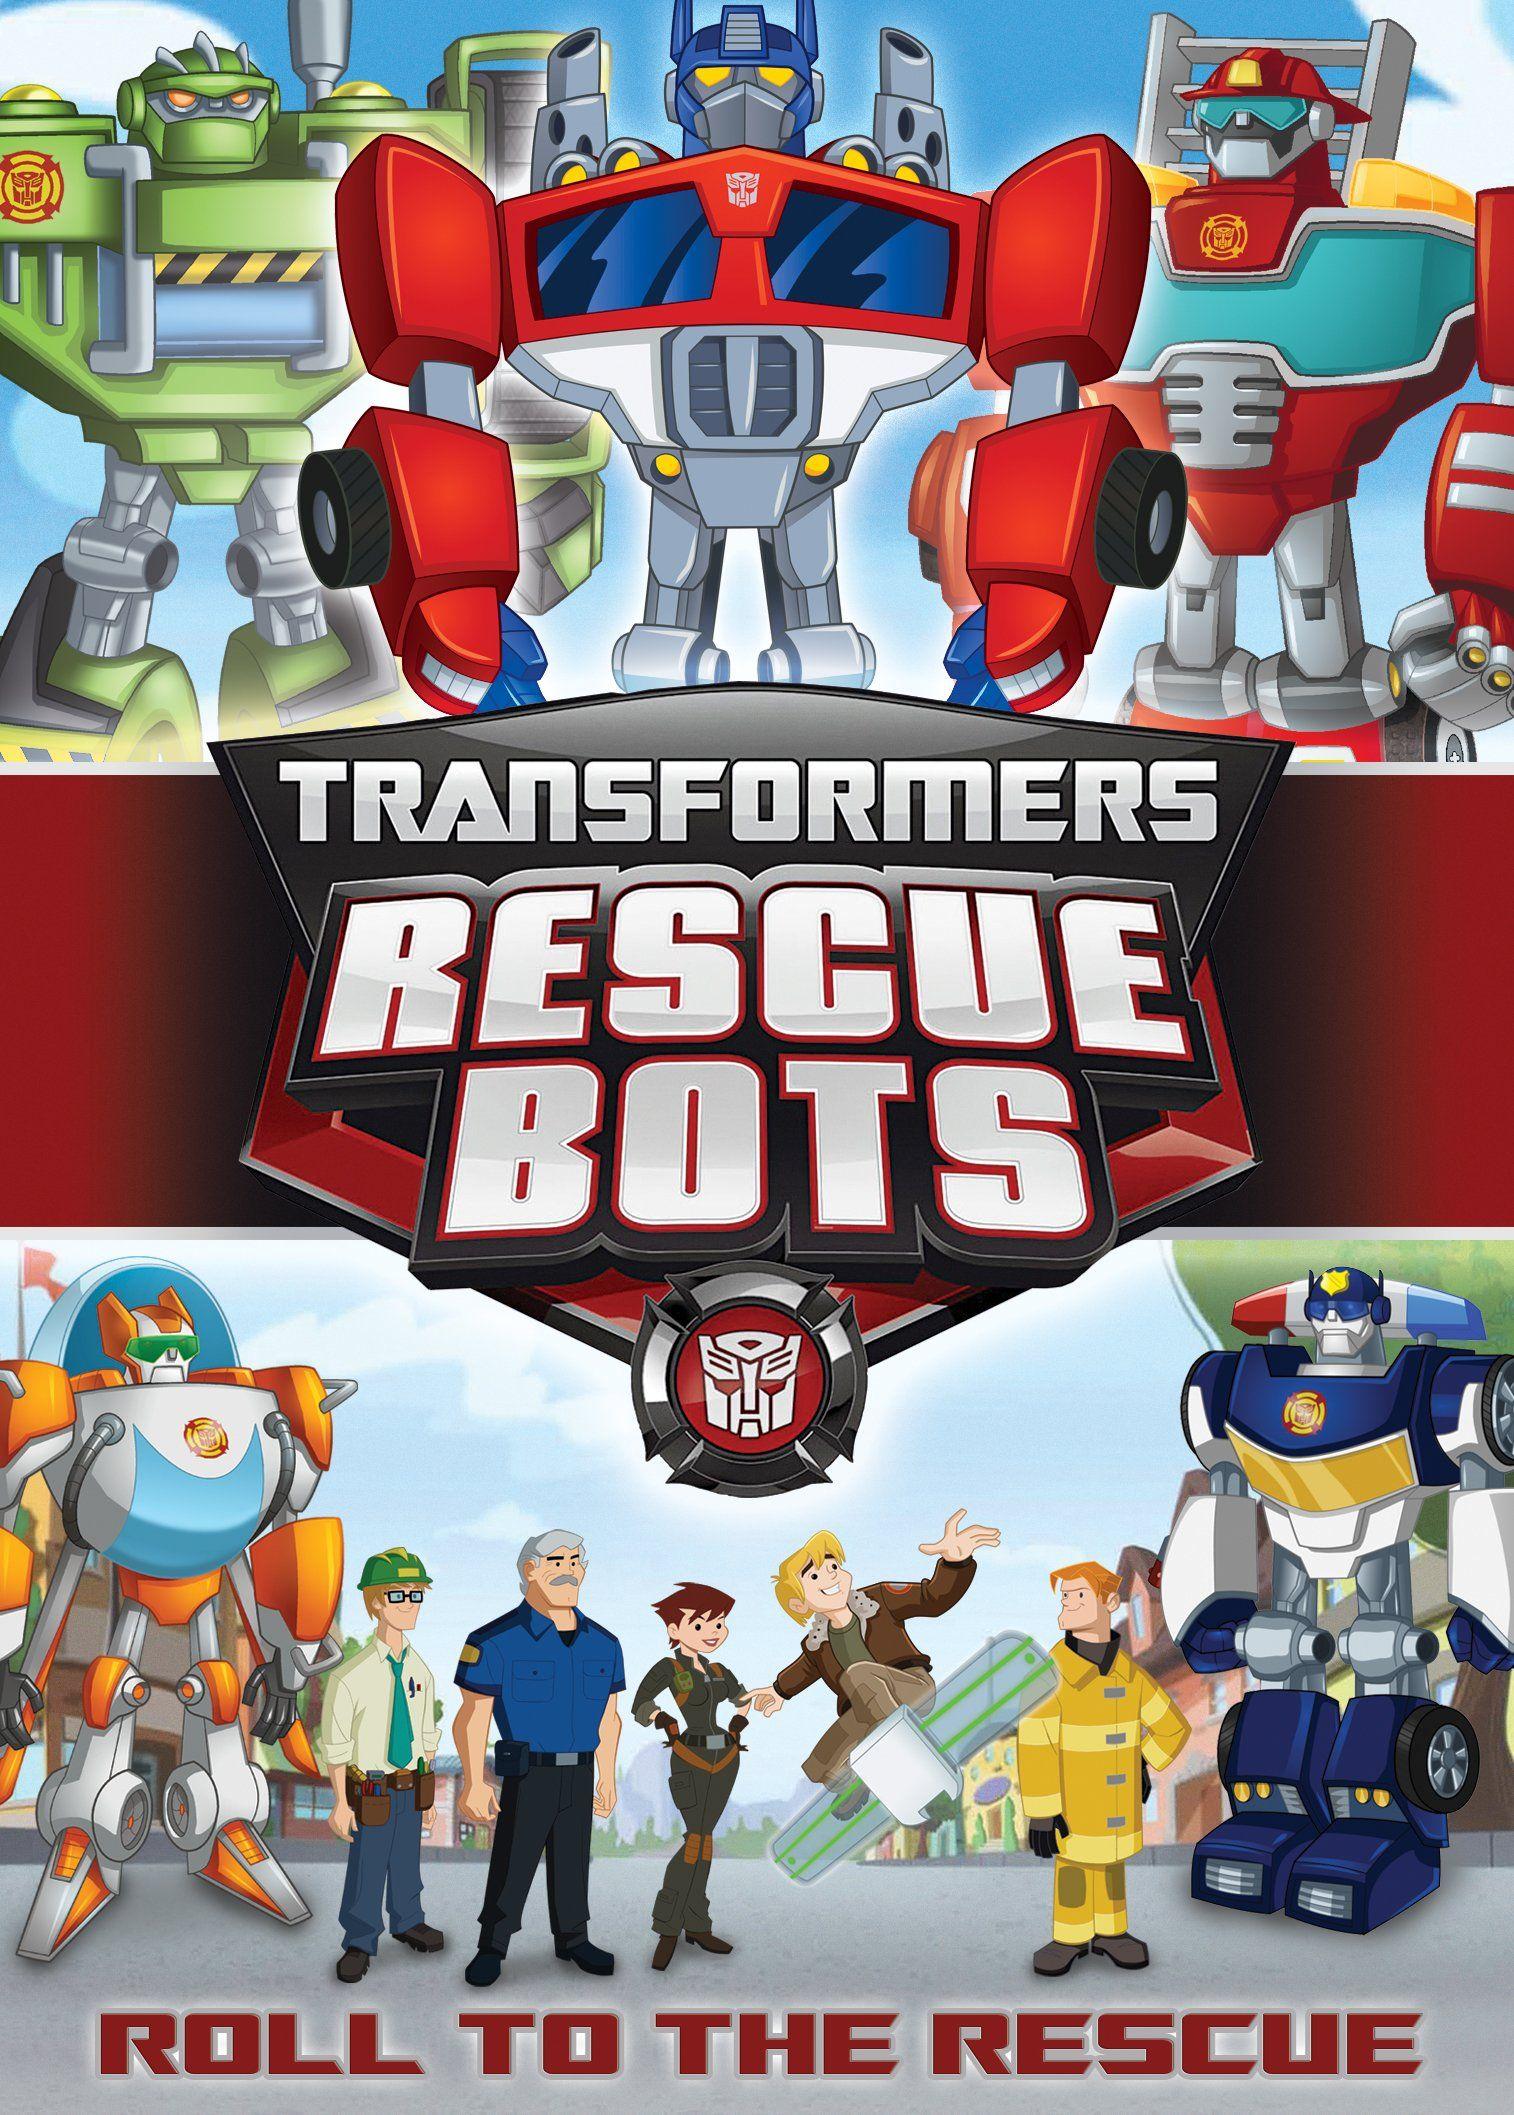 Robot Check Rescue Bots Transformers Rescue Bots Transformers